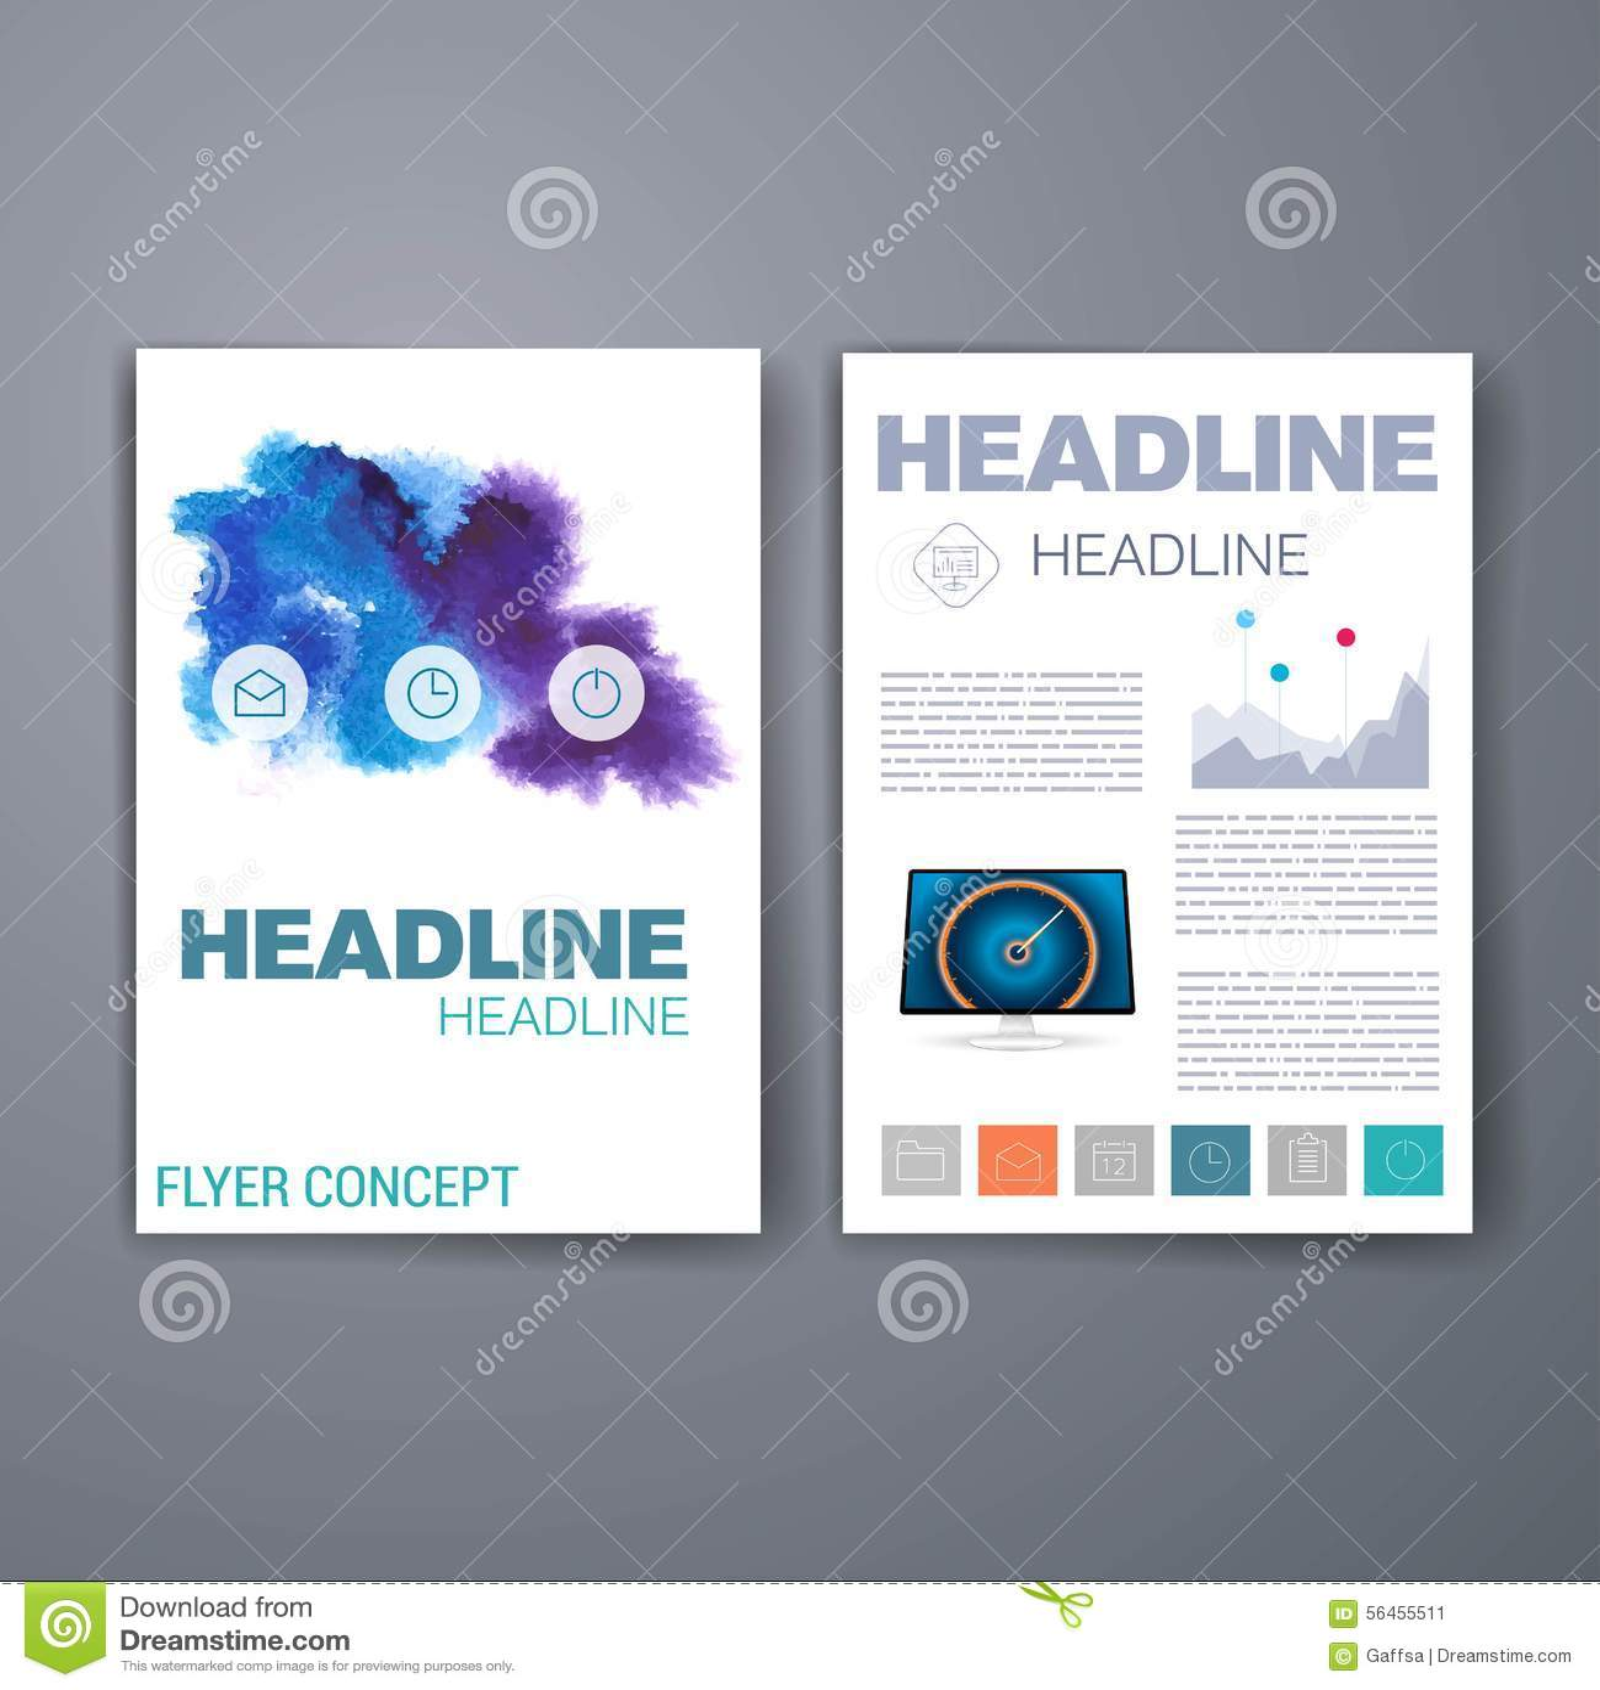 Templates  Design Set Of Web, Mail, Brochures Stock